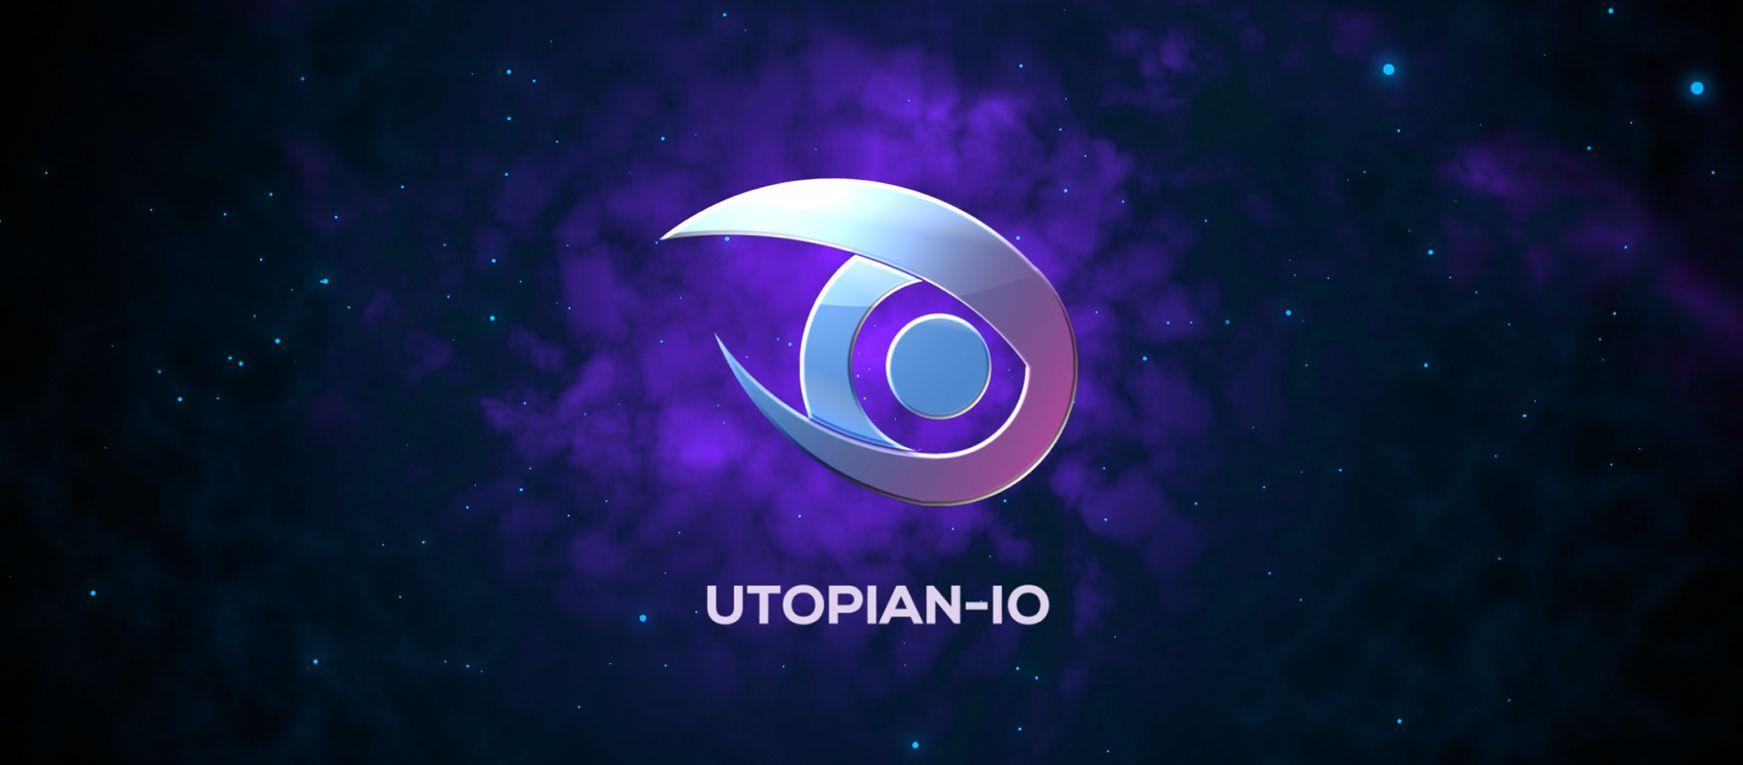 Contribute your developer skills on open source projects via utopian.io